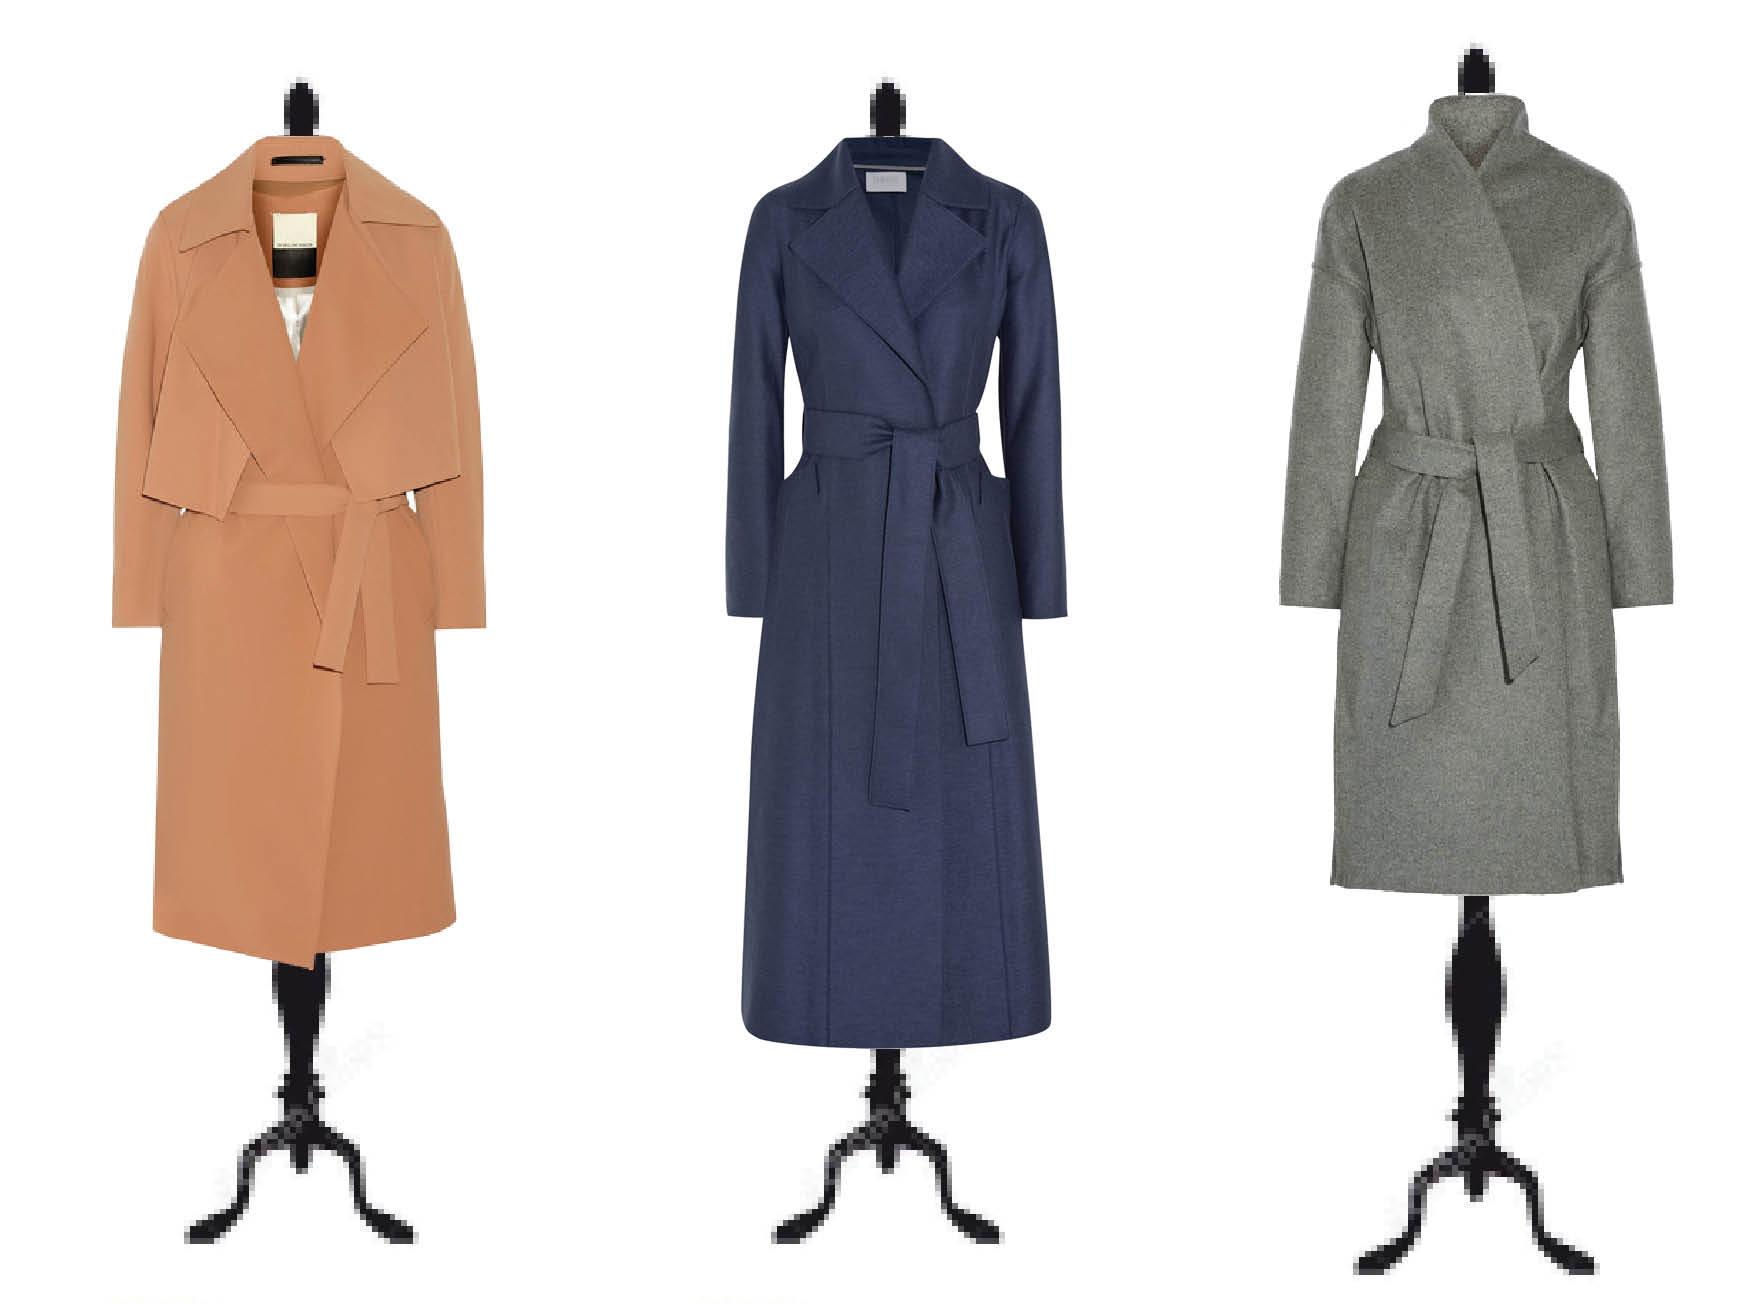 Выбор Marie Claire: пальто-халат-320x180